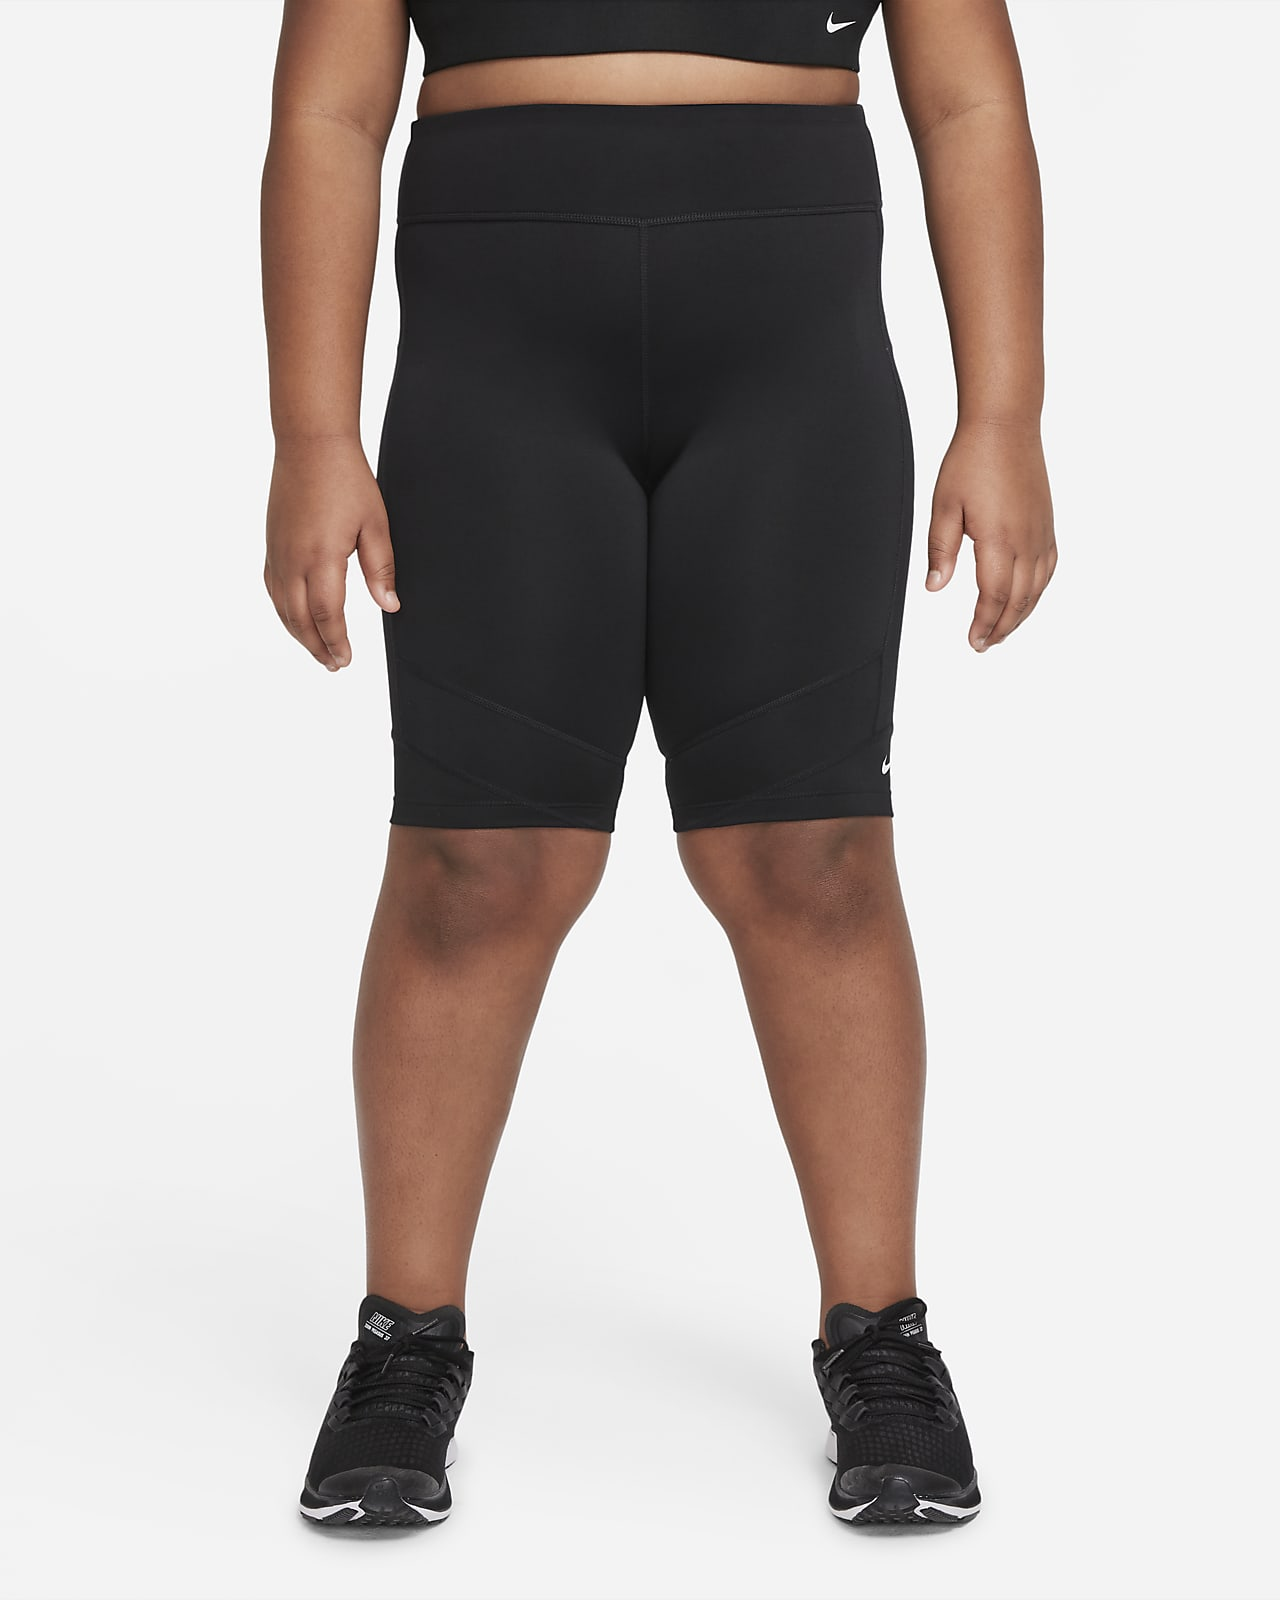 Nike Dri-FIT One Older Kids' (Girls') Bike Shorts (Extended Size)